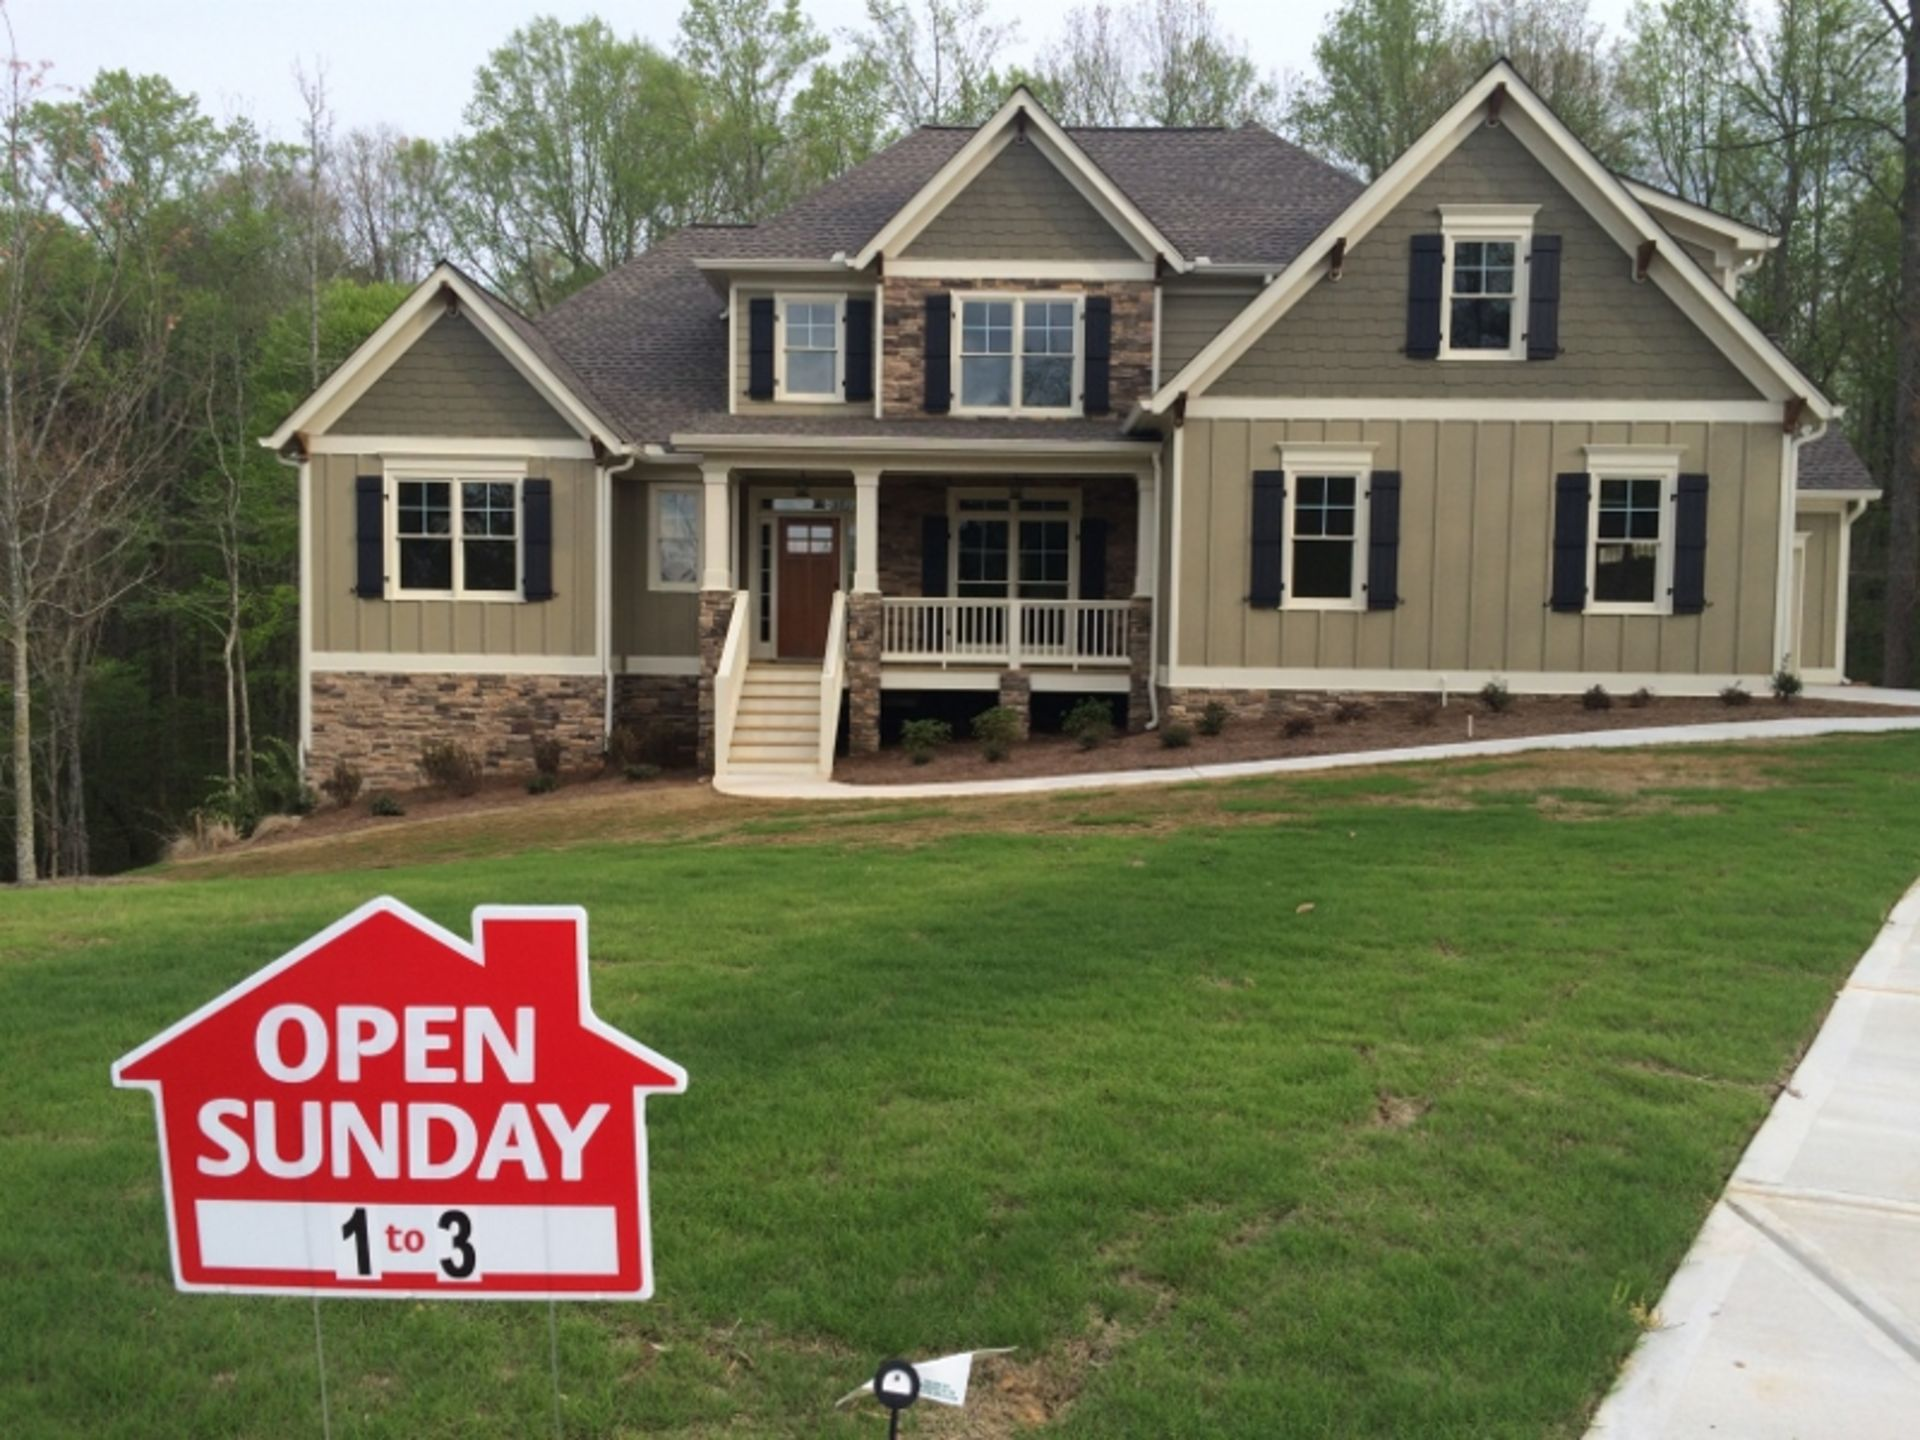 Open Houses Aren't Just for Buyers